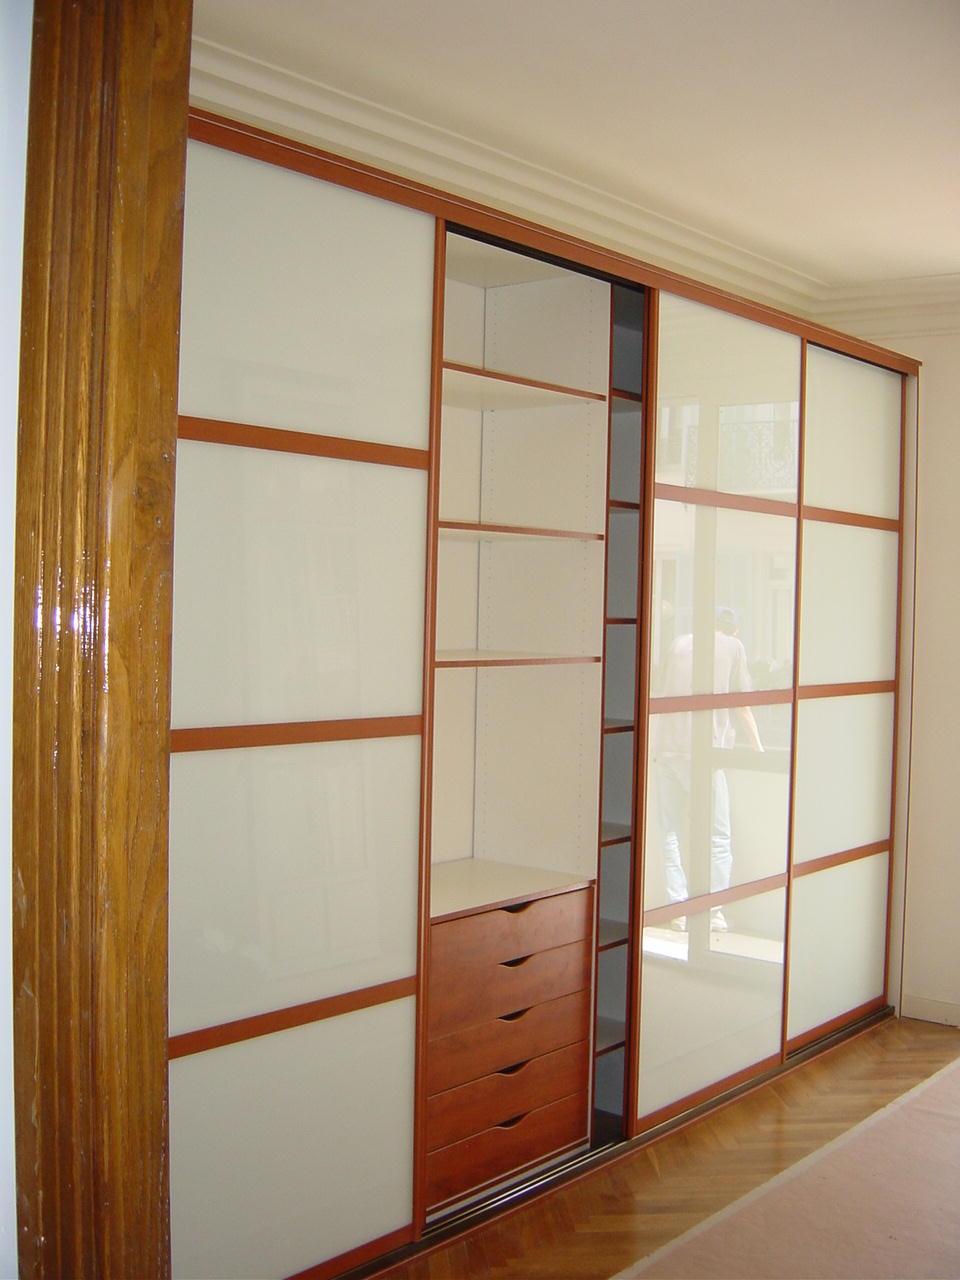 placard mon beau placard blog univers du placard. Black Bedroom Furniture Sets. Home Design Ideas